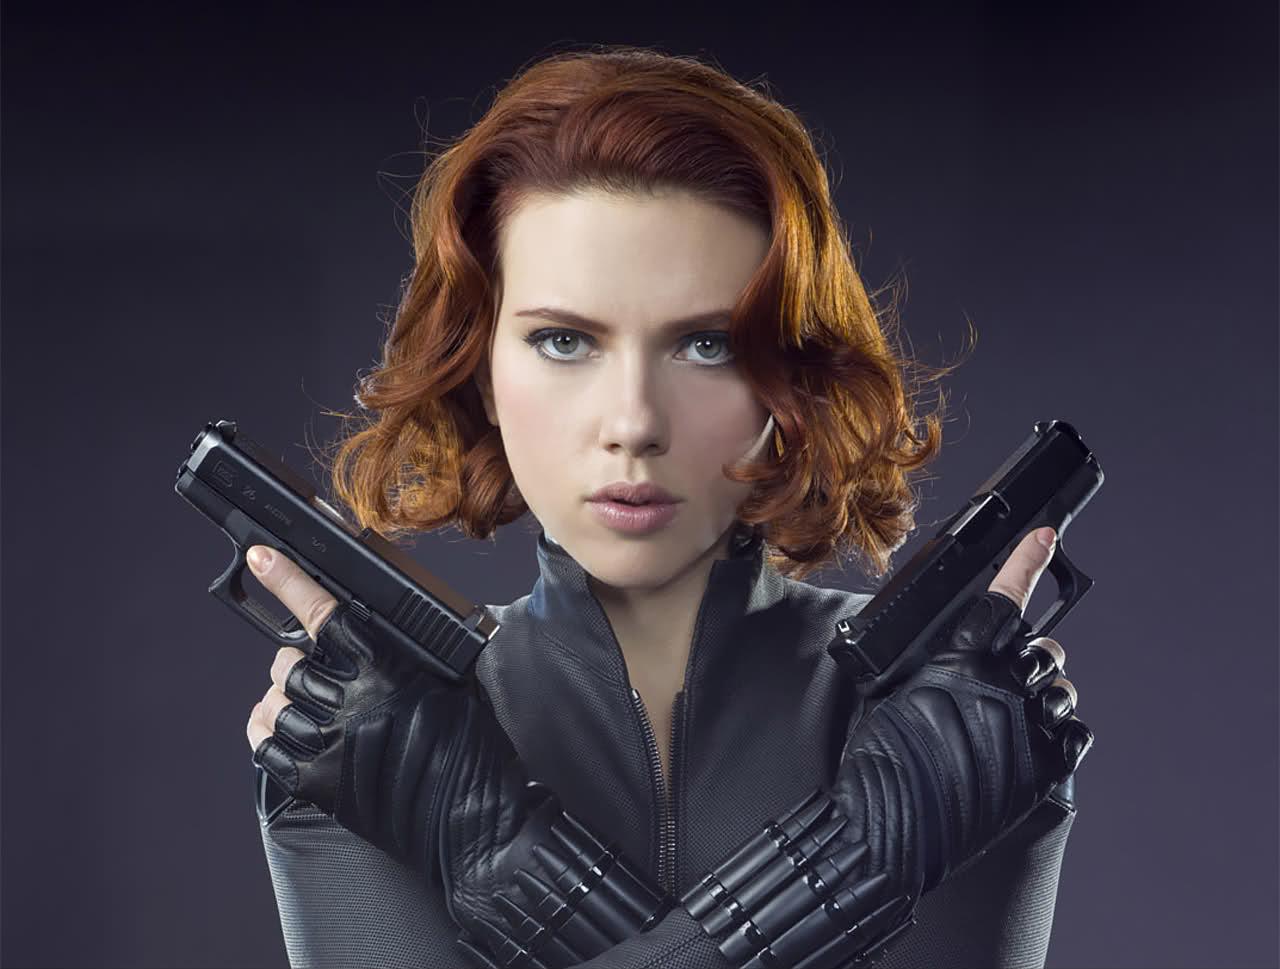 Black Widow Project Management